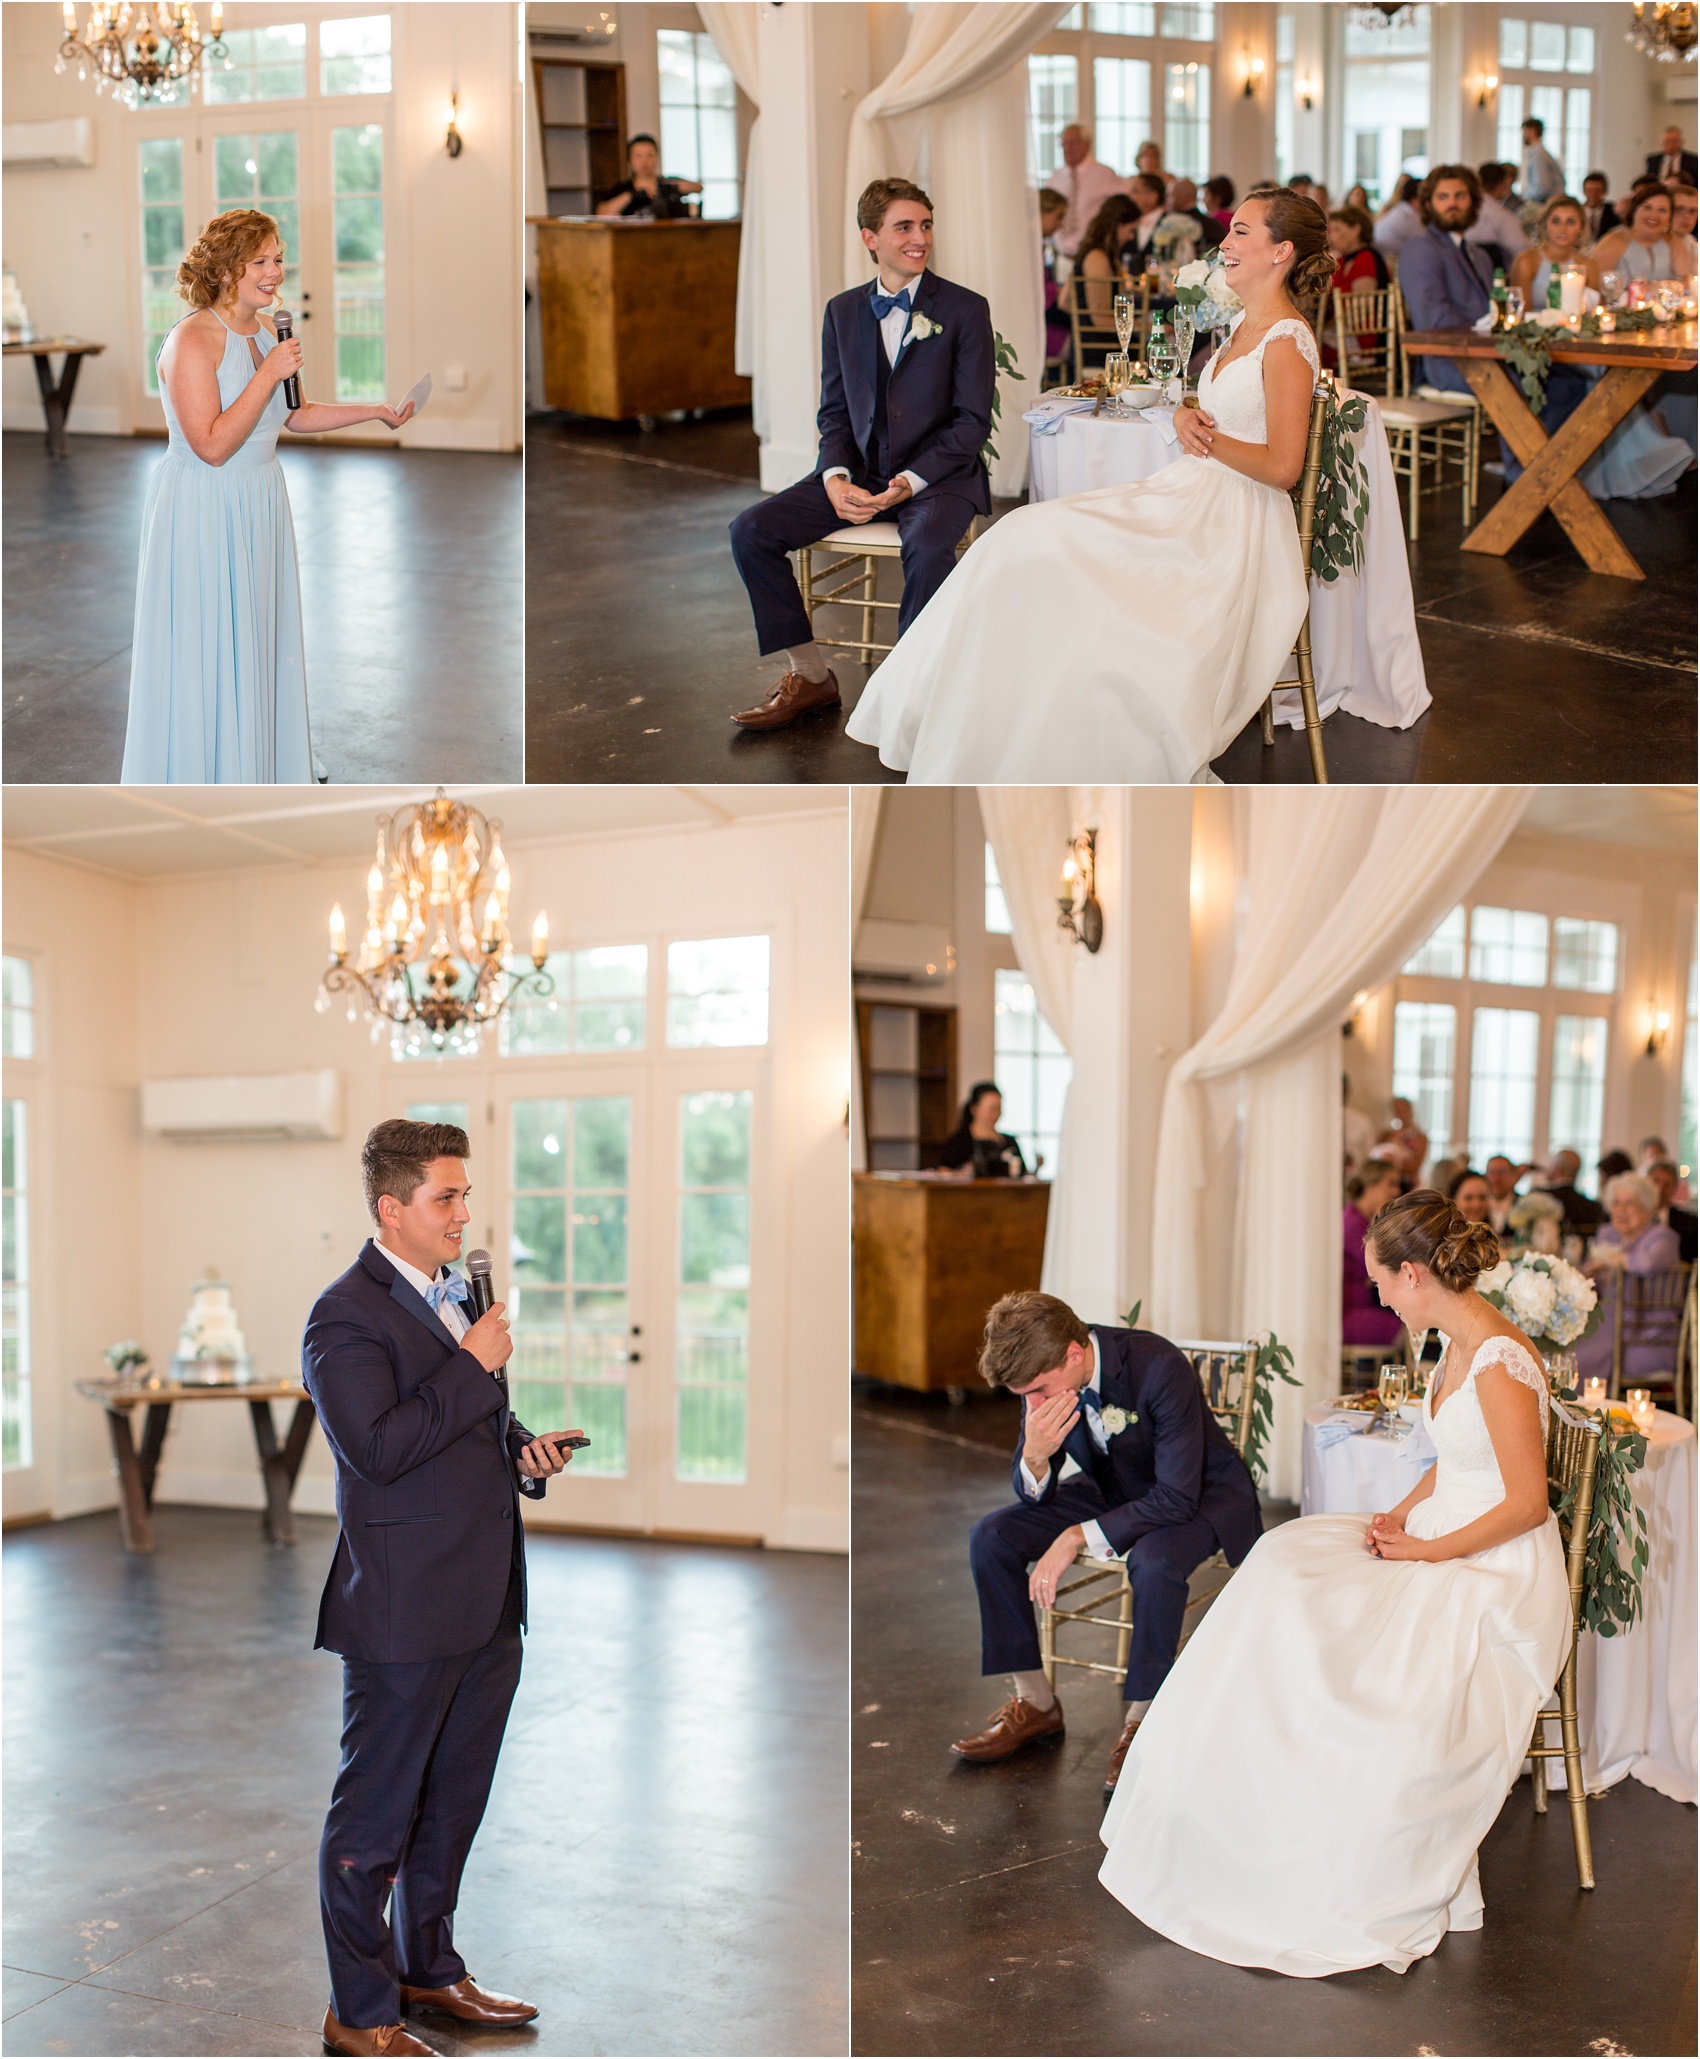 Savannah Eve Photography- Sigl-Adams Wedding- Sneak Peek-78.jpg